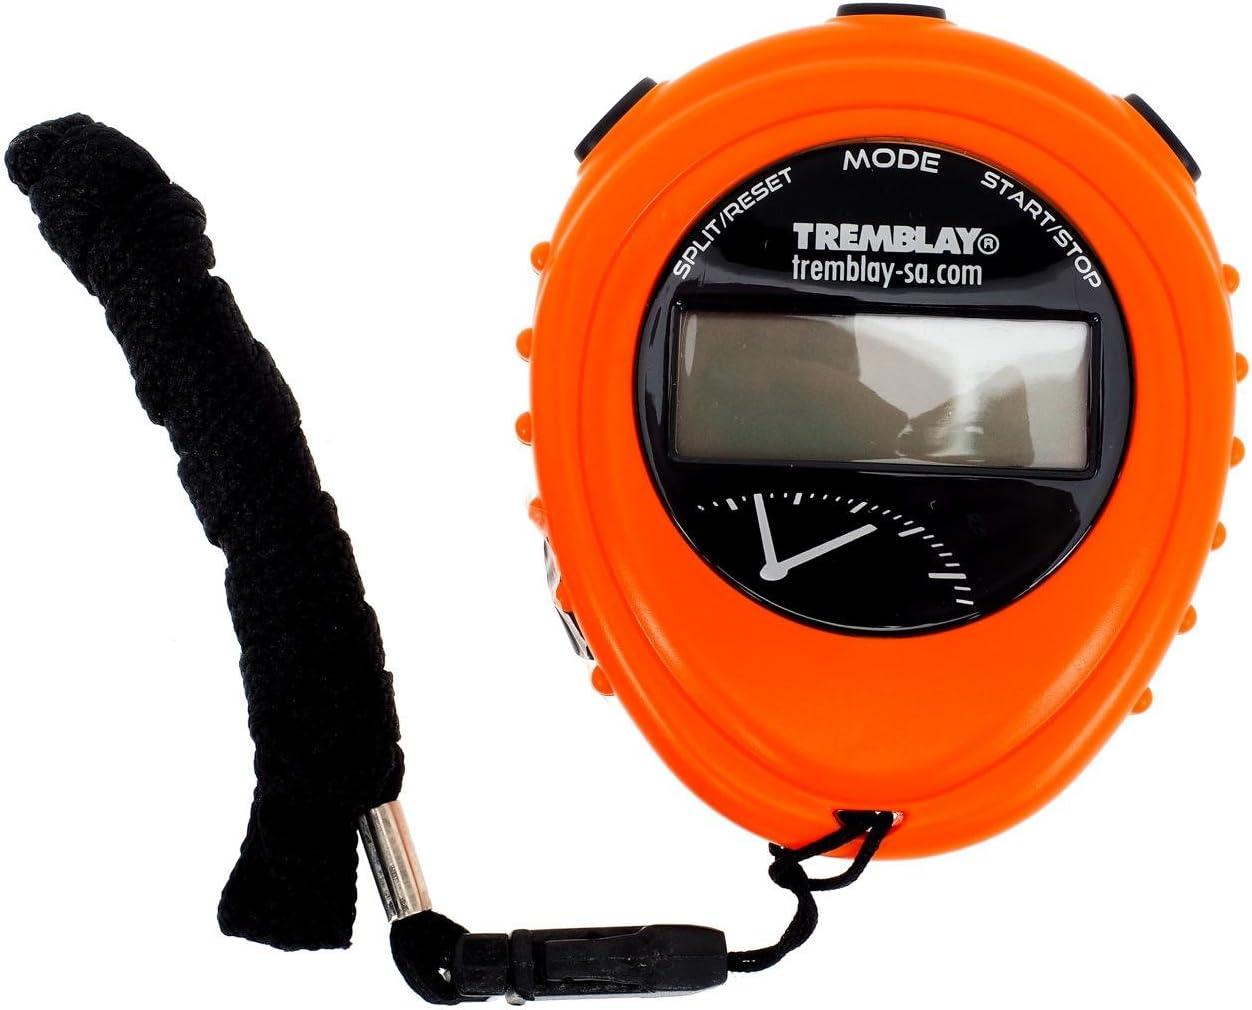 Taille Unique Orange Chronometre Tremblay Chronometre 14 Orange